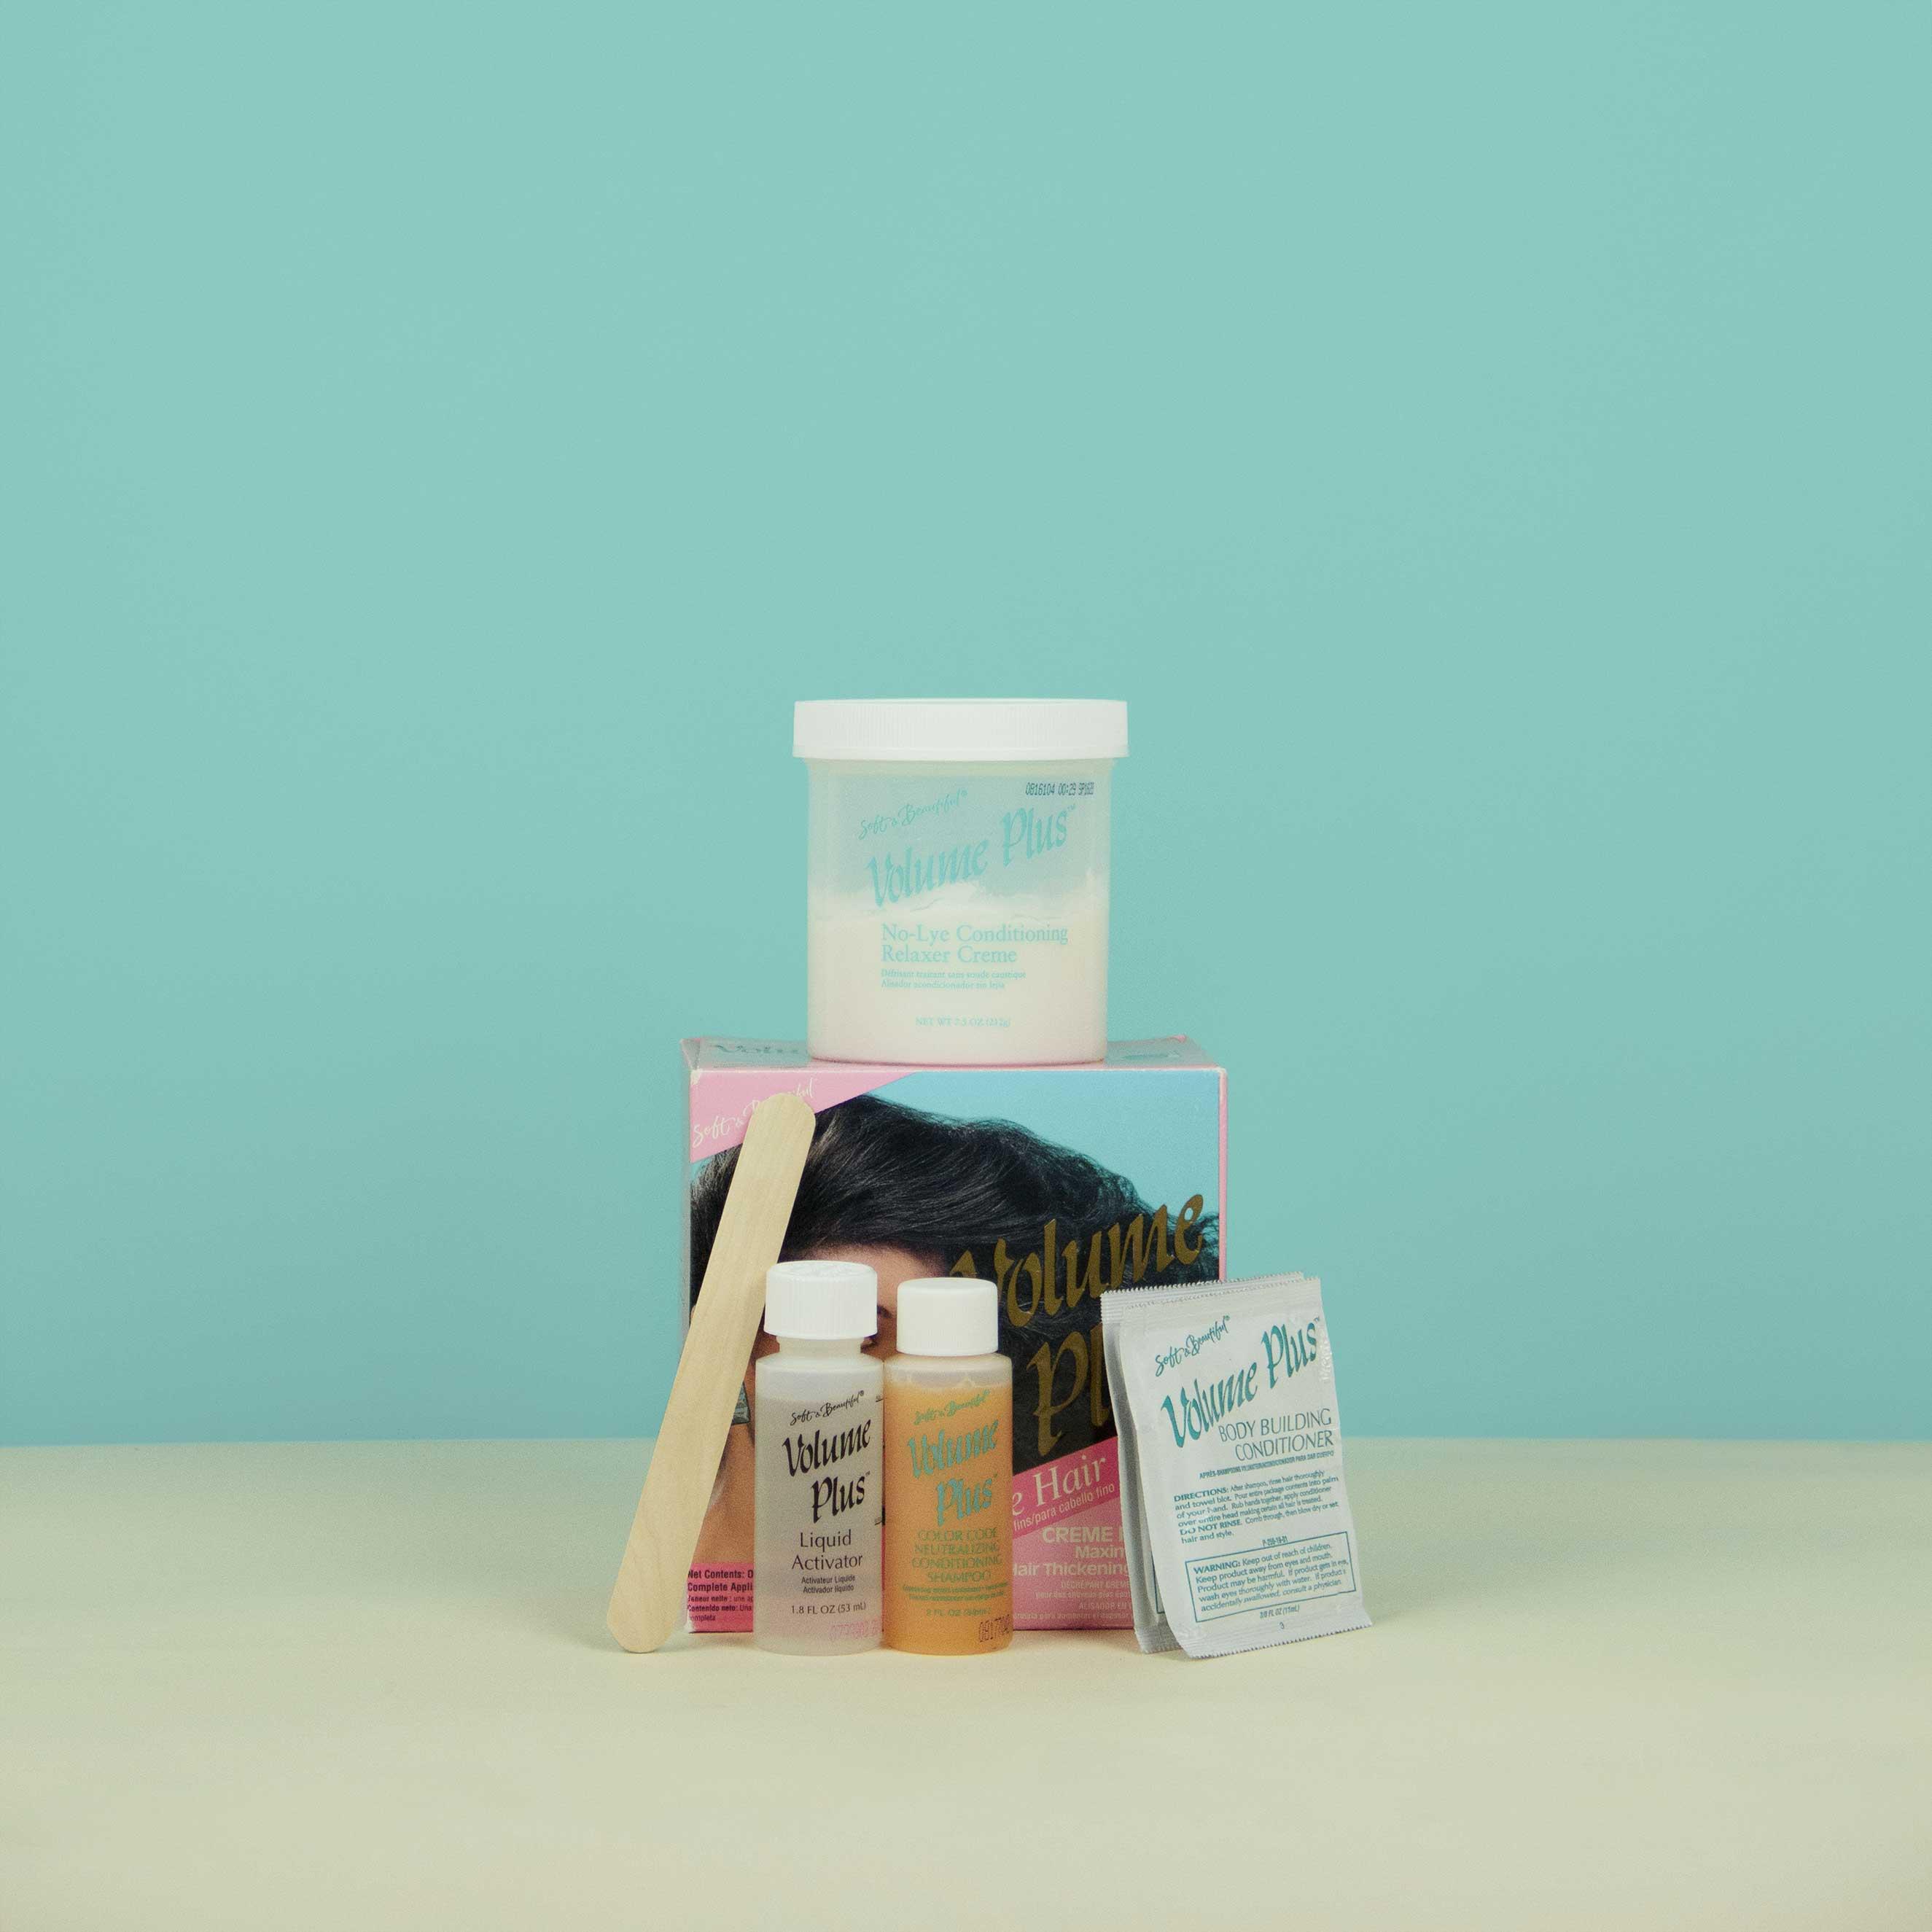 'Volume Plus', Façade Objects